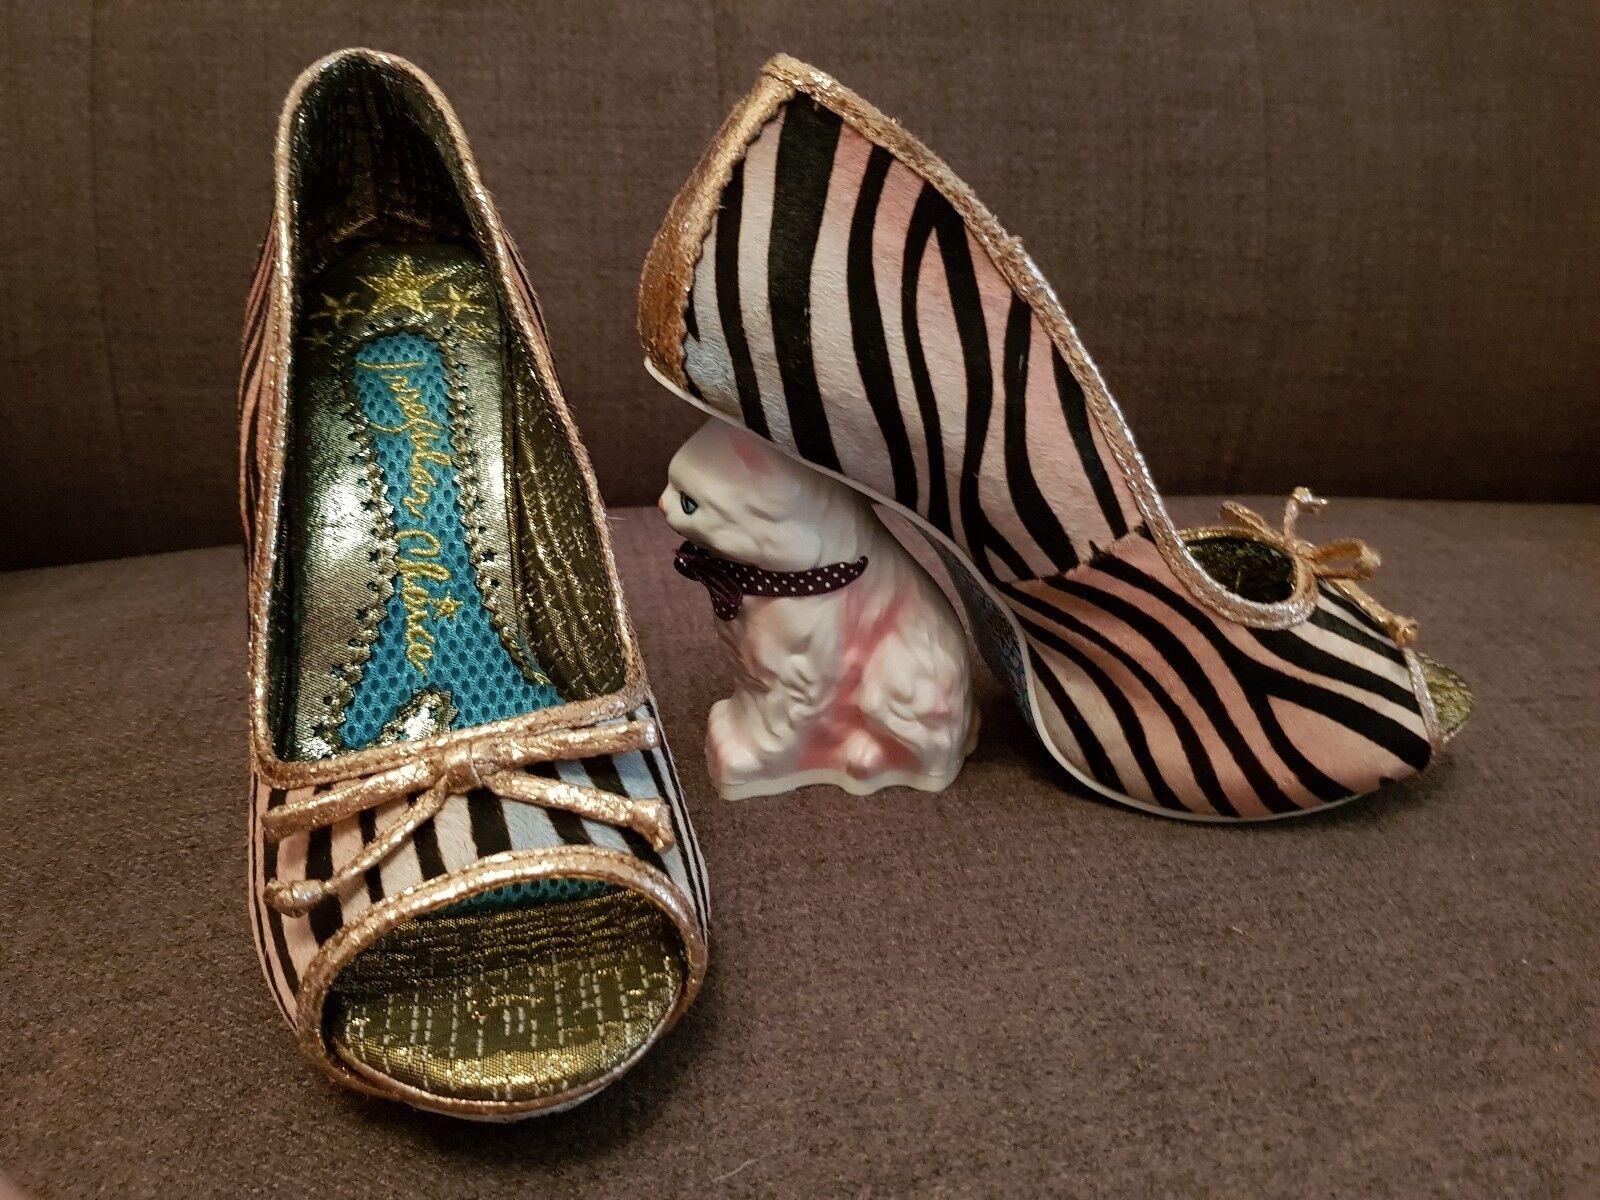 Descuento de liquidación Irregular Choice Paw Print. Cat Heels. Rainbow Zebra print. Size 4.